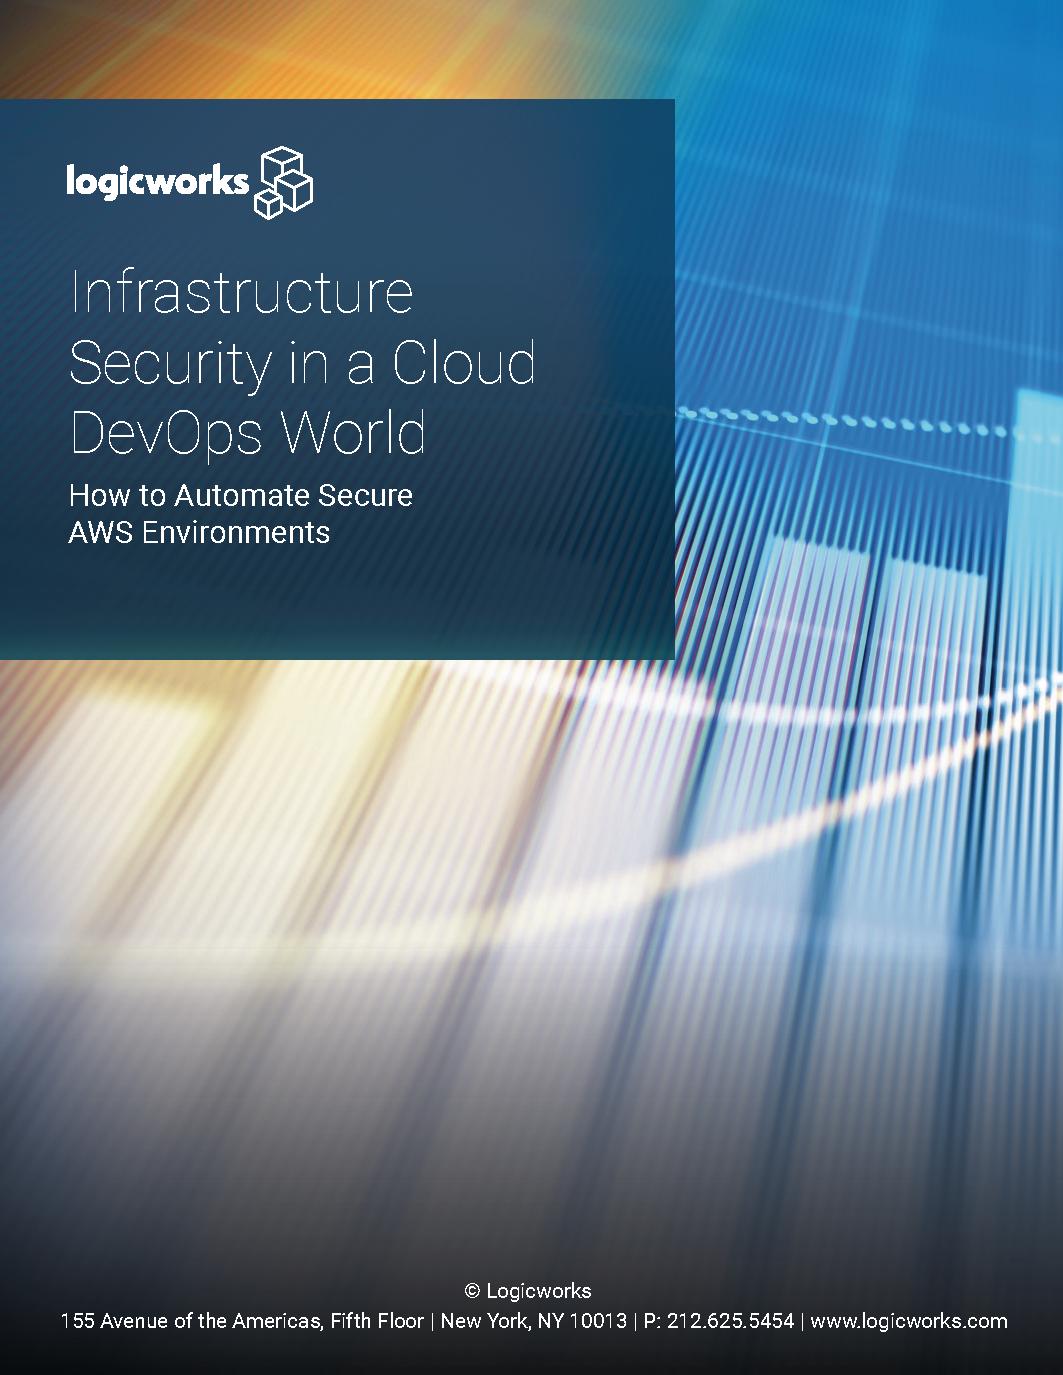 Logicworks eBook - Infrastructure Security in a Cloud DevOps World